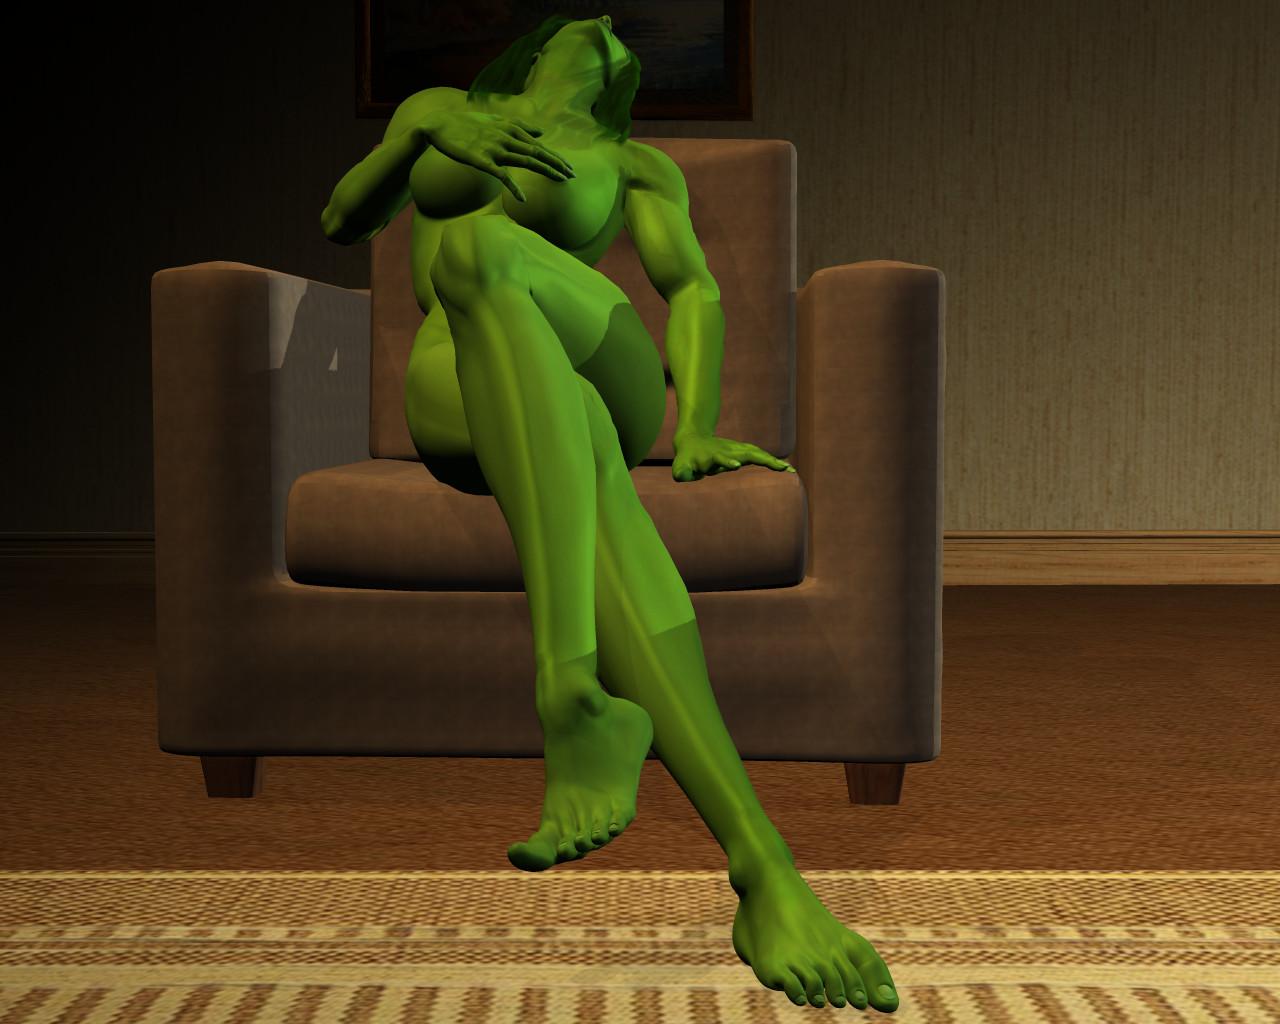 She hulk - Exclusive 43 by MorganCygnus